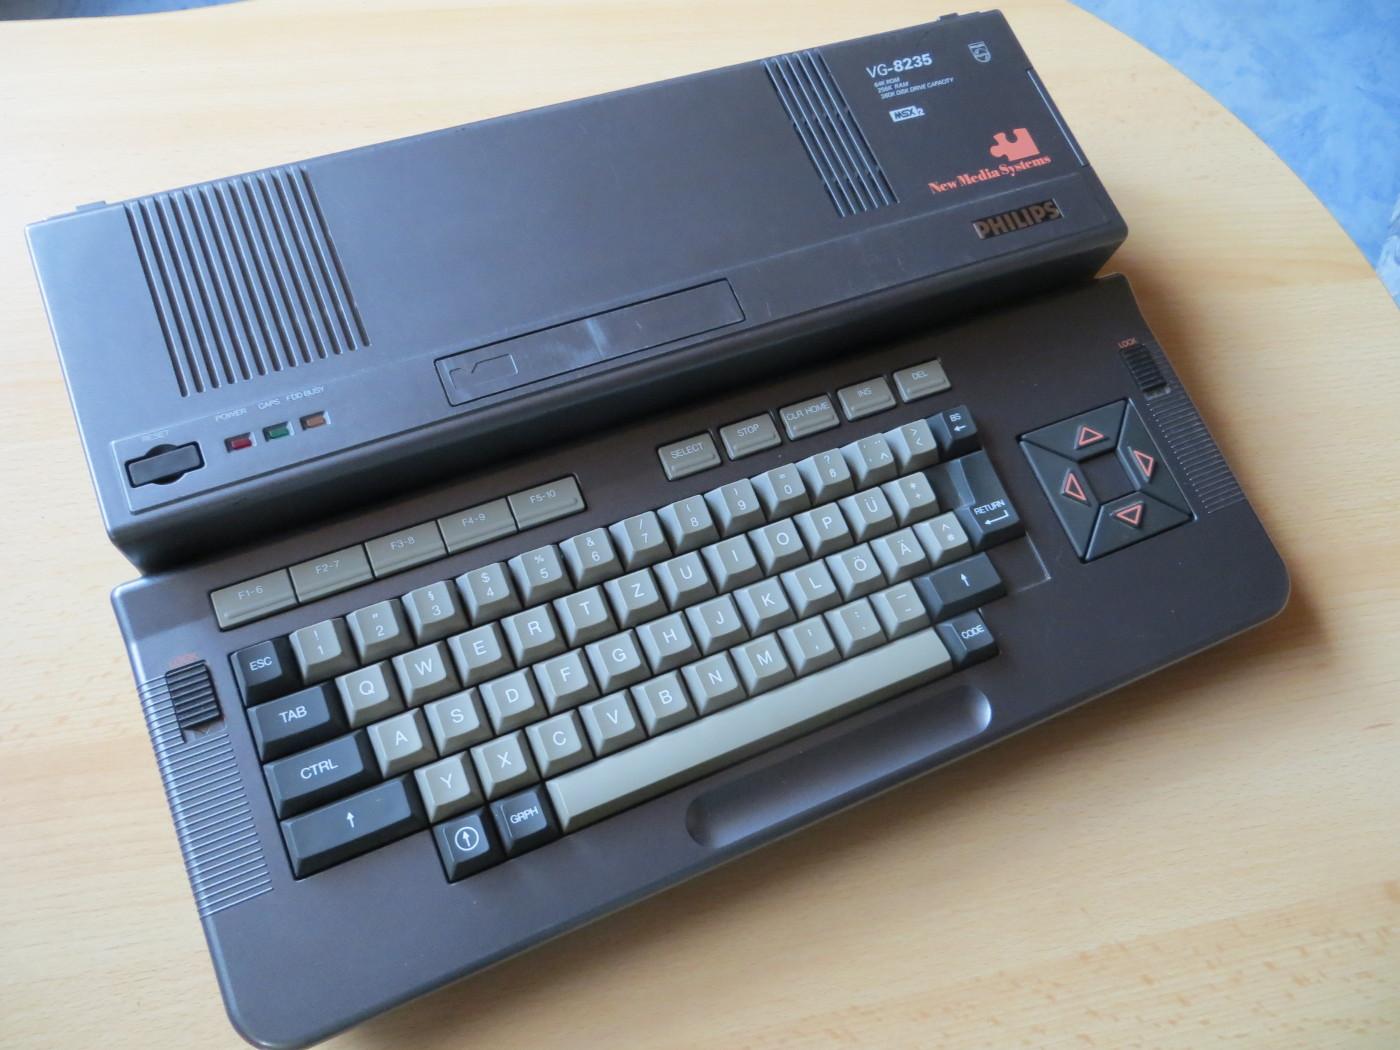 Philips VG-8235